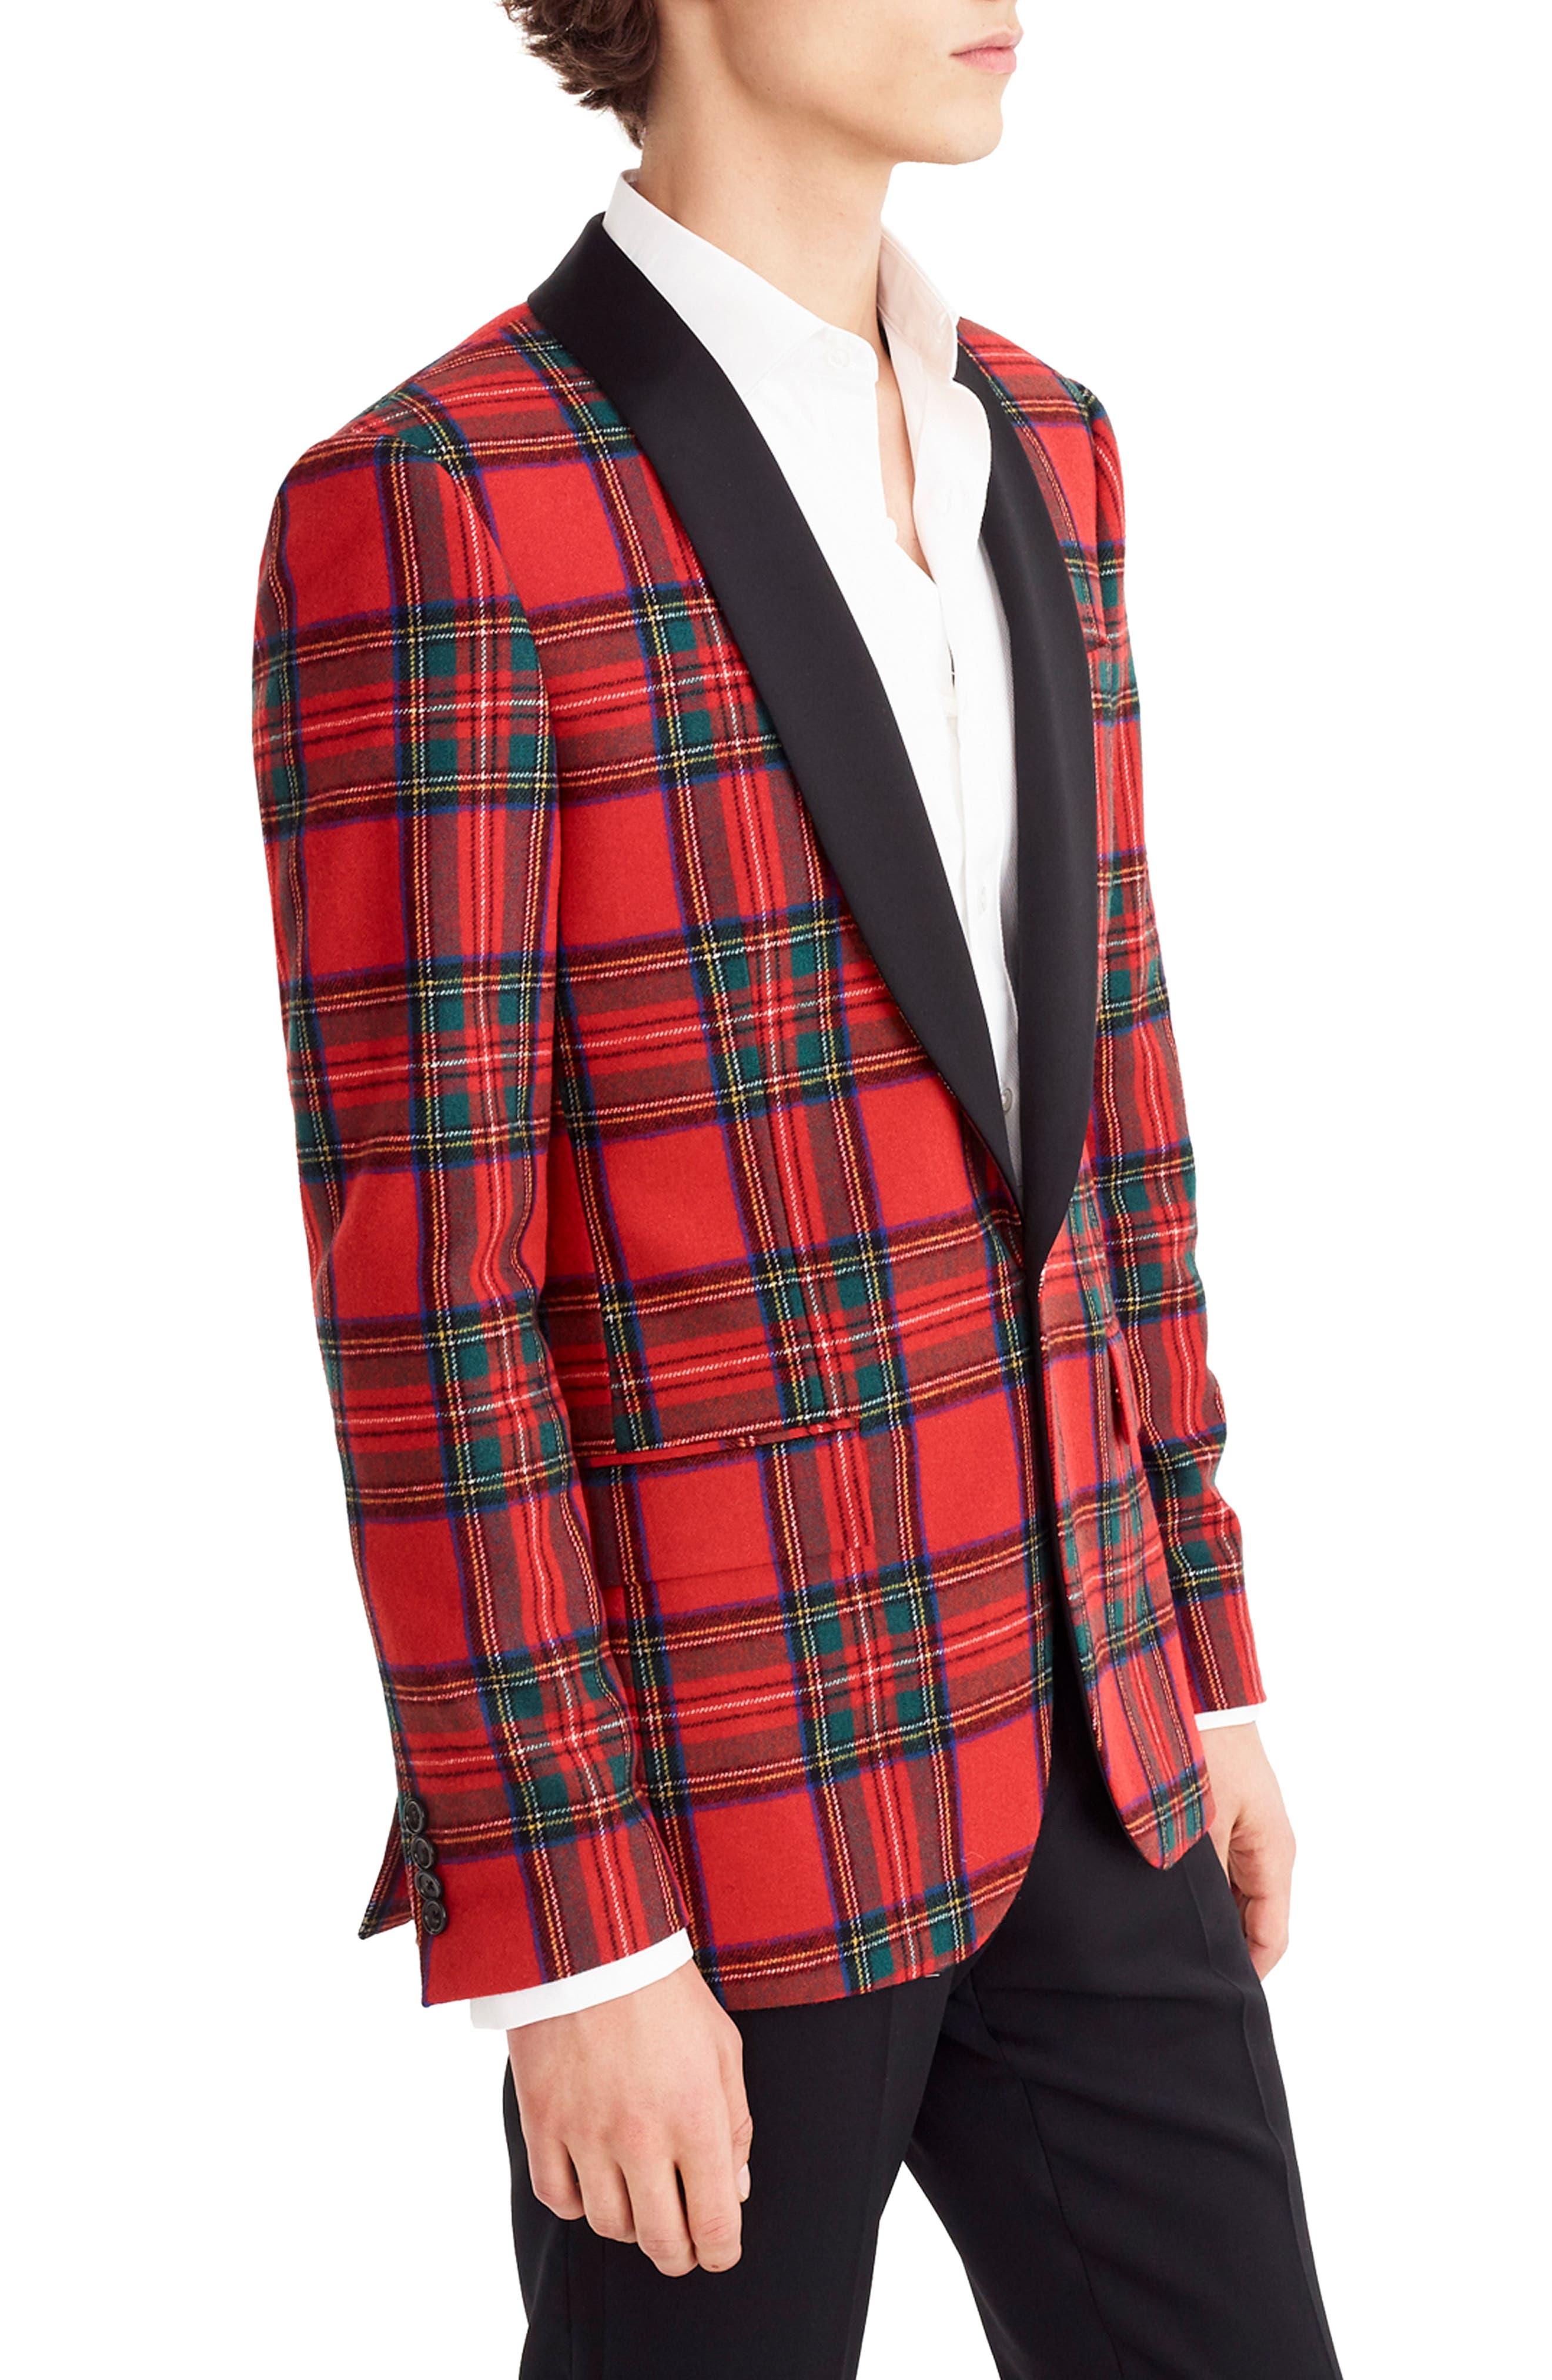 J.CREW,                             Ludlow Slim Fit Tartan Wool Blend Dinner Jacket,                             Alternate thumbnail 3, color,                             600